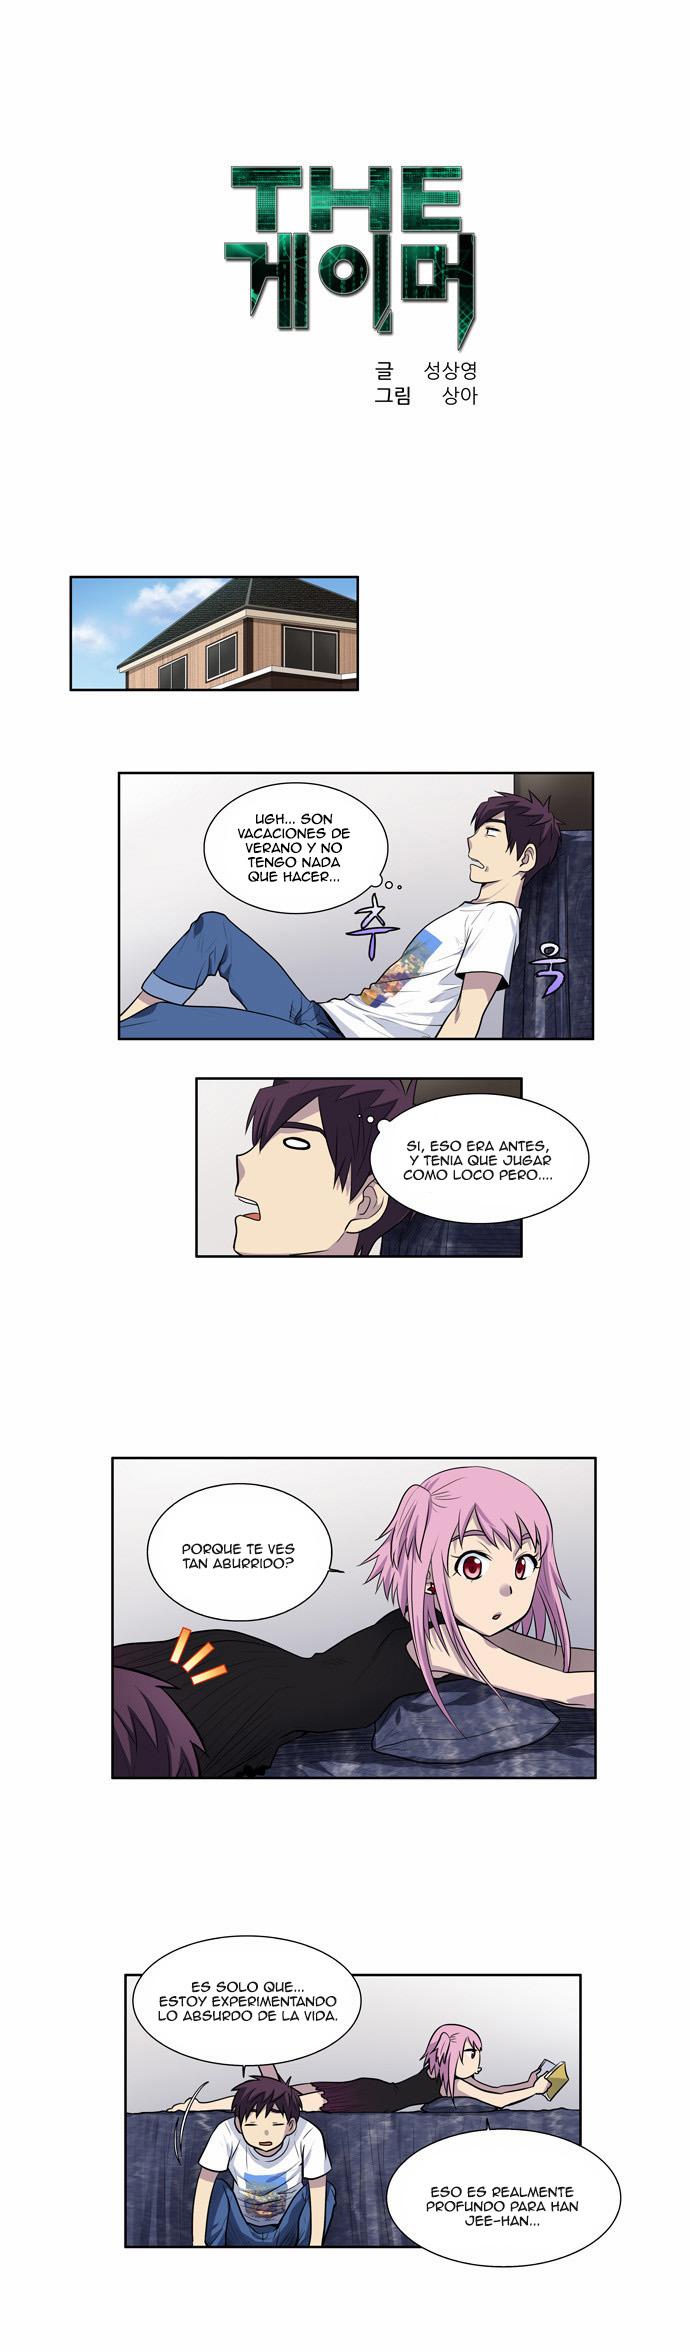 https://c5.ninemanga.com/es_manga/61/1725/415025/85bb07bea16780c3974da113d3b0805f.jpg Page 2